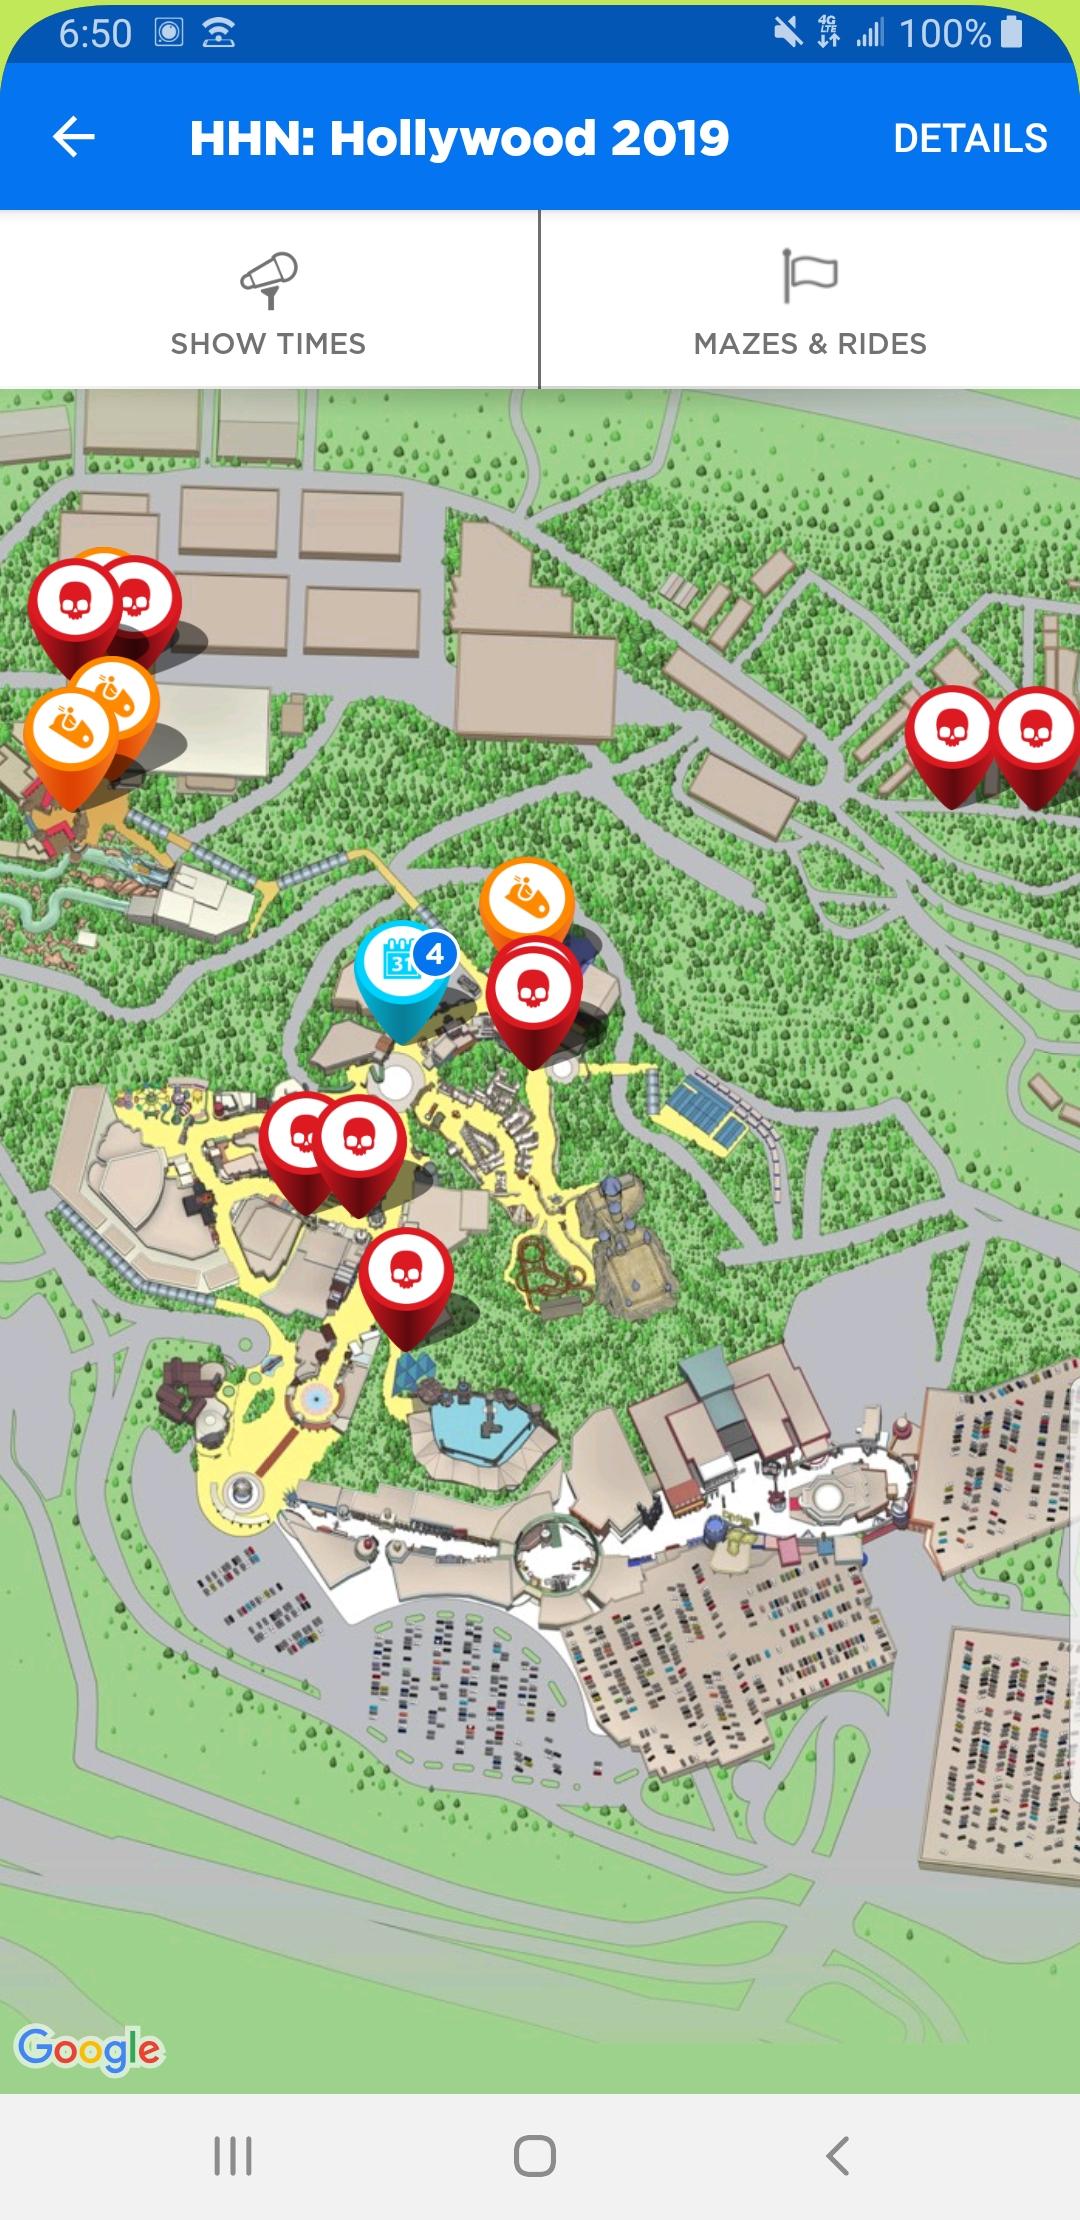 Universal Studios Map 2019 : universal, studios, Hollywood, Mazes, Rides:, Universalstudios